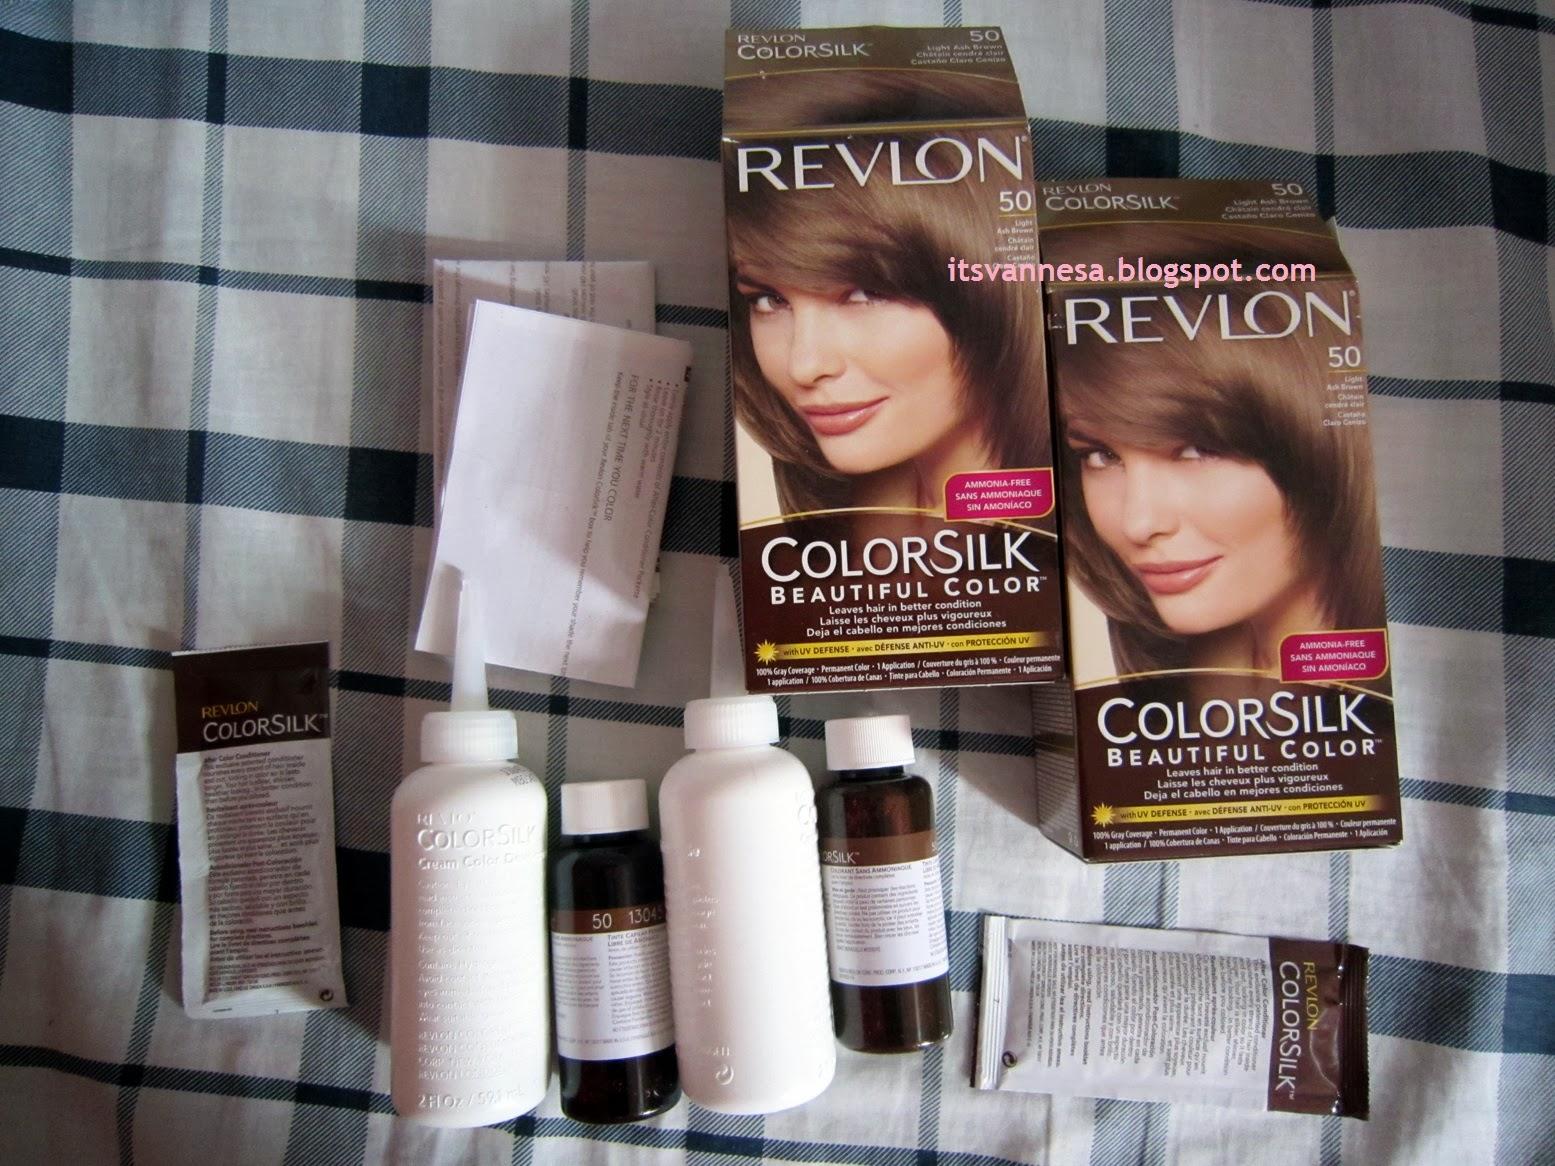 Vanne San Pedro Coloring My Hair Revlon Colorsilk Beautiful Color